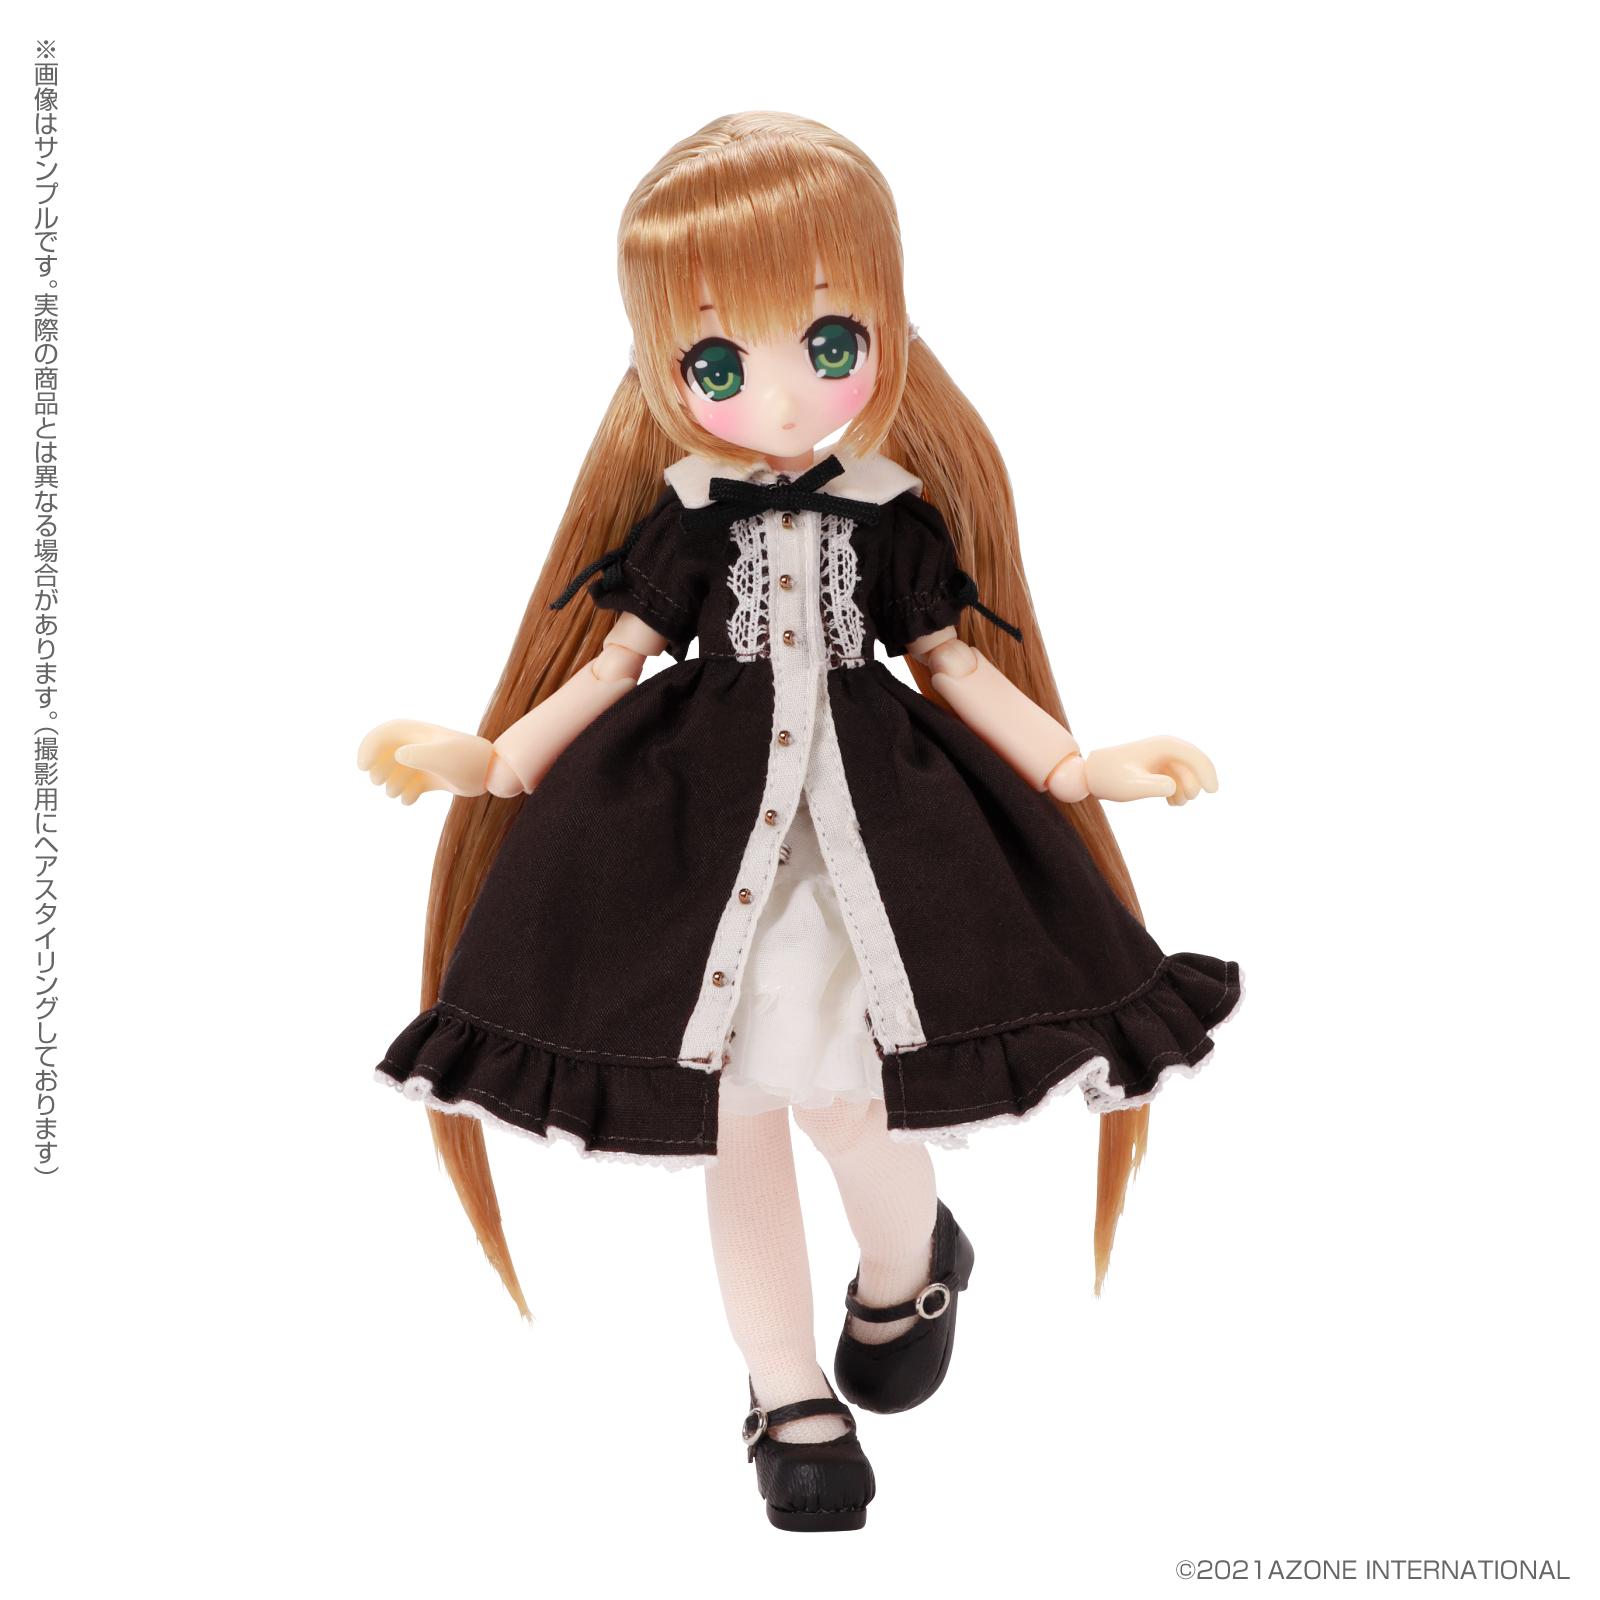 Lil'Fairy ~ちいさなお手伝いさん~『リプー 7th anniv.(ノーマル口ver.)』1/12 完成品ドール-010